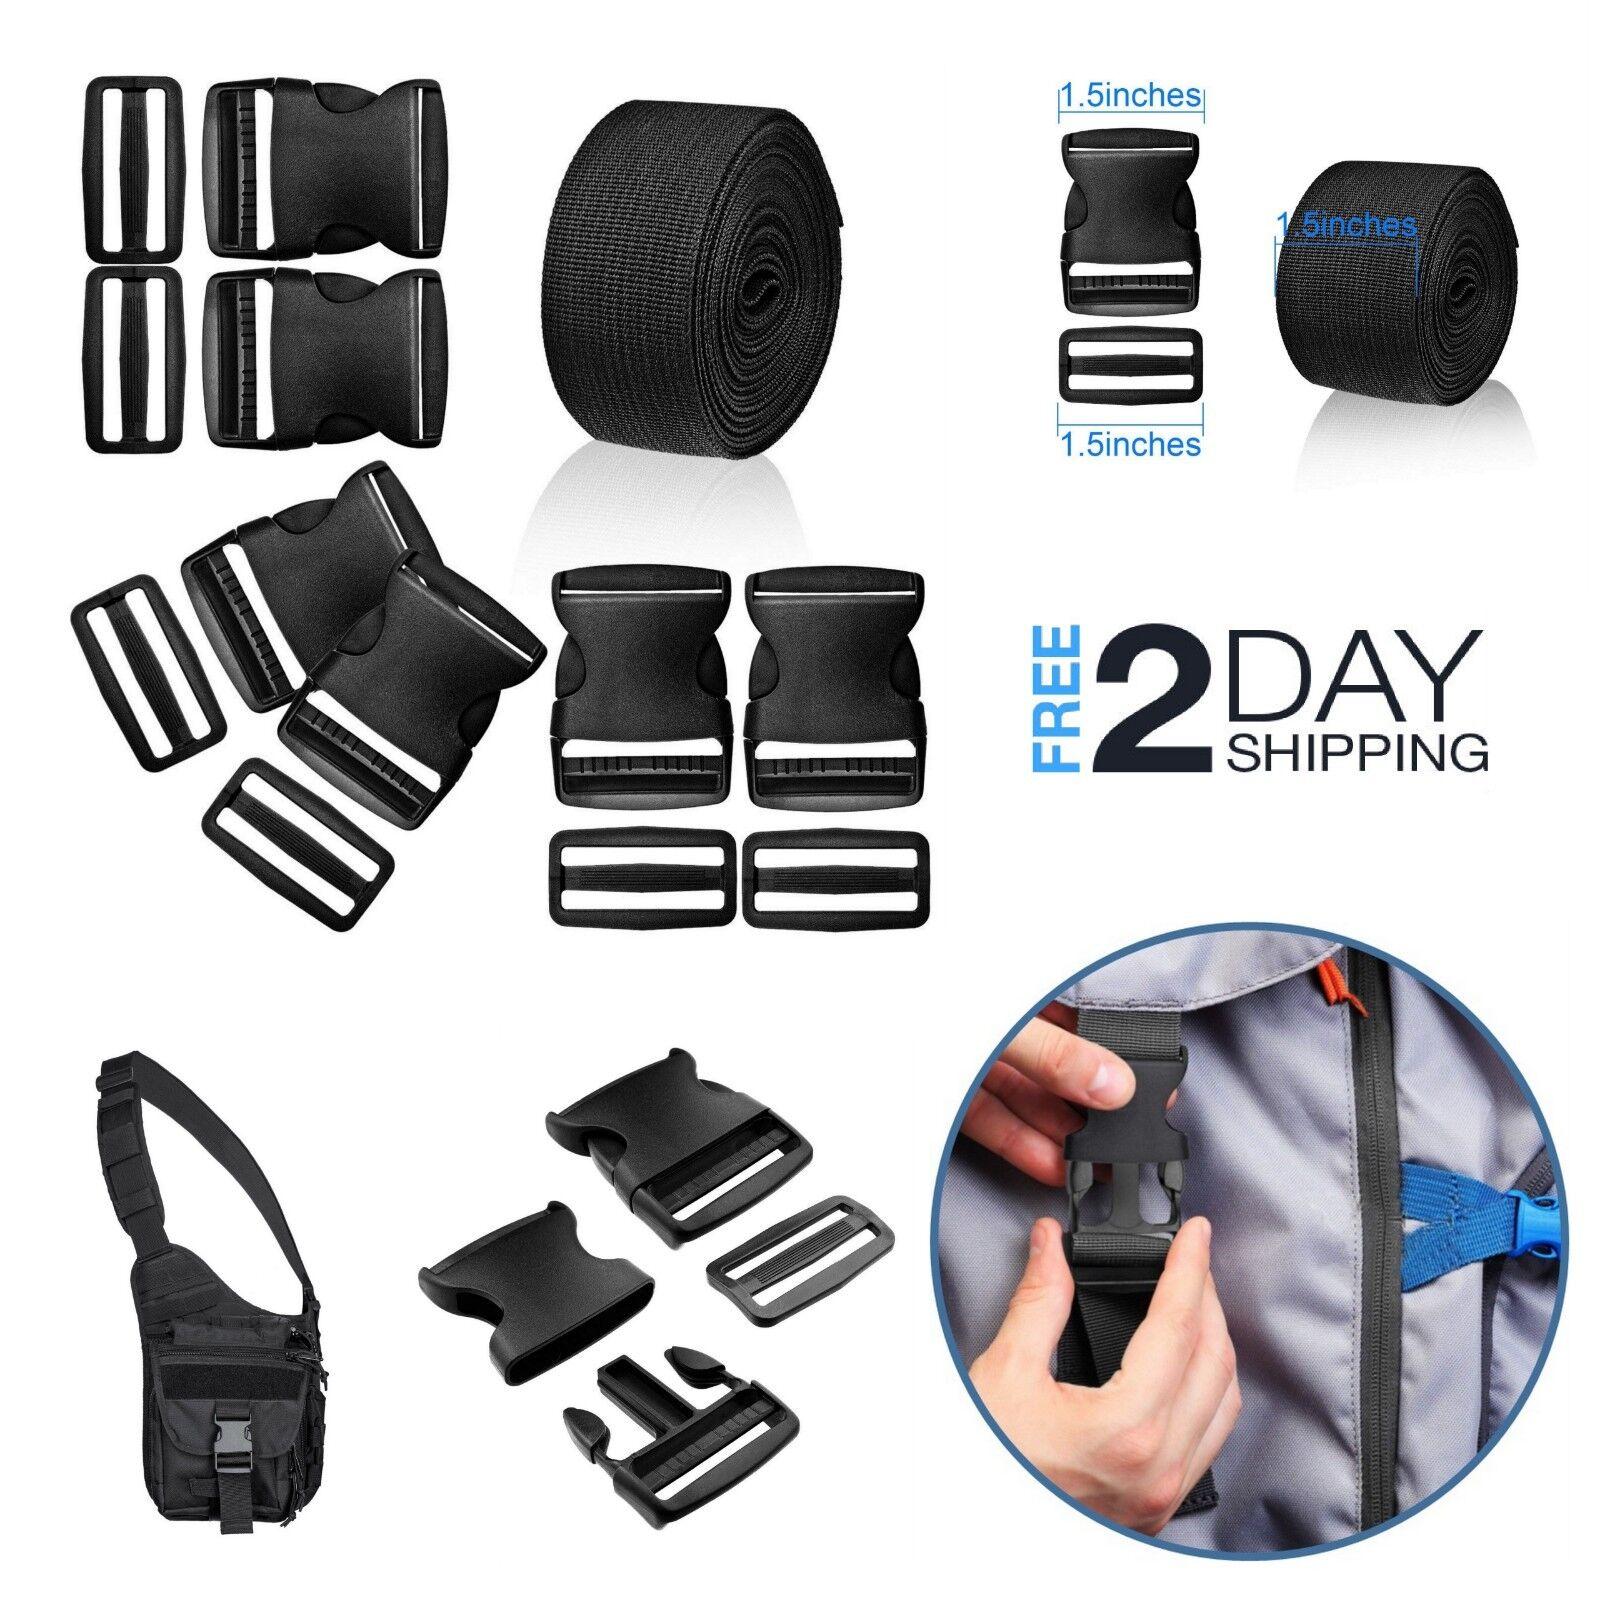 1.5 Inch Plastic Buckle Nylon Strap Webbing Kit Release Dura